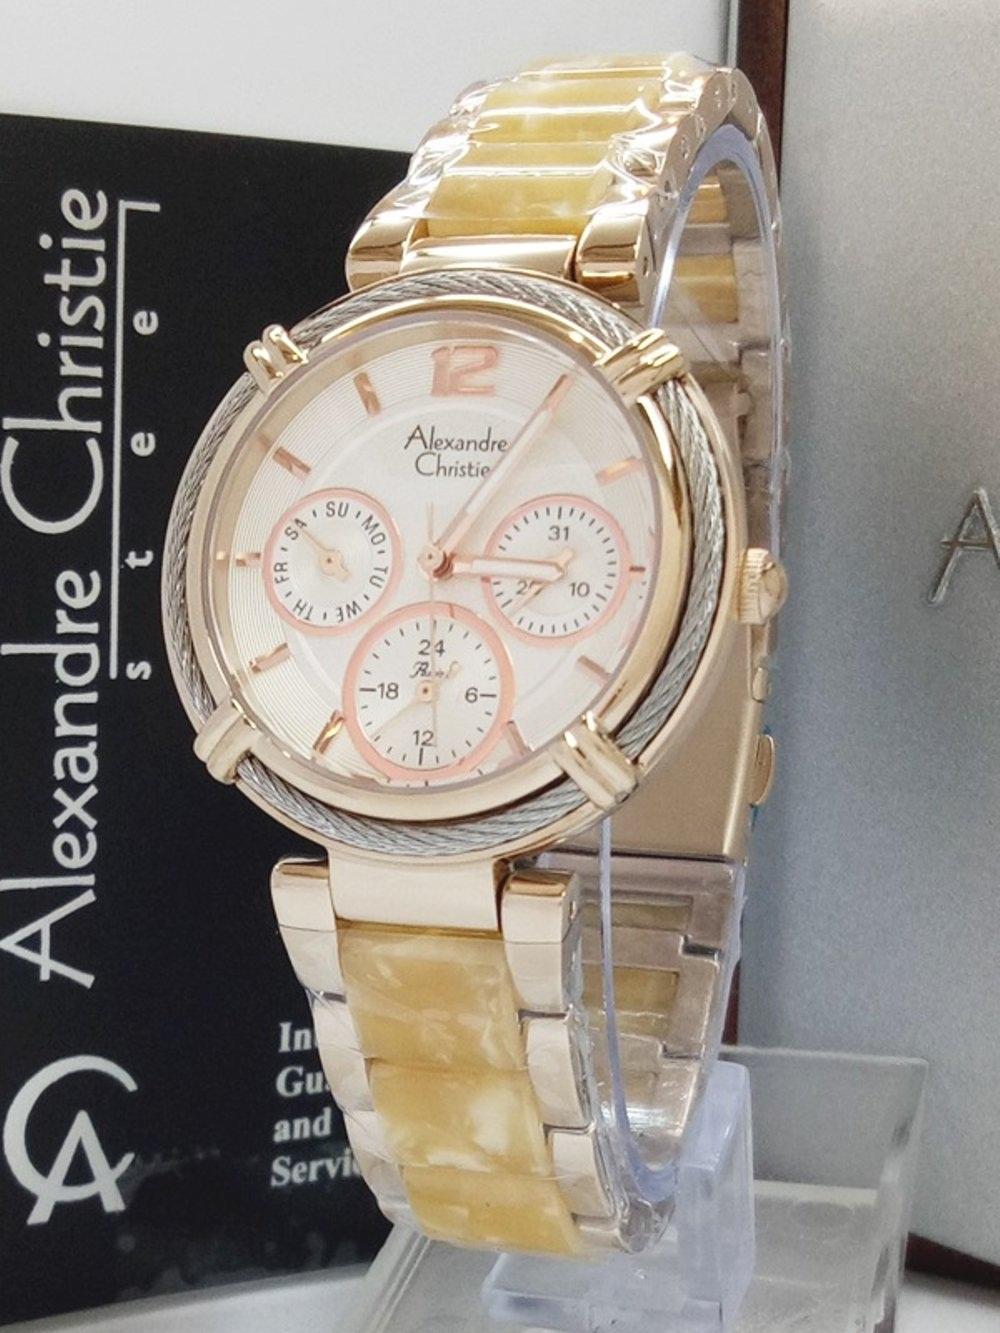 Features Alexandre Christie Ac2655 Jam Tangan Wanita Stainless Pria 6324 Silver Hitam Original Ceramic Rosegold Merah 4